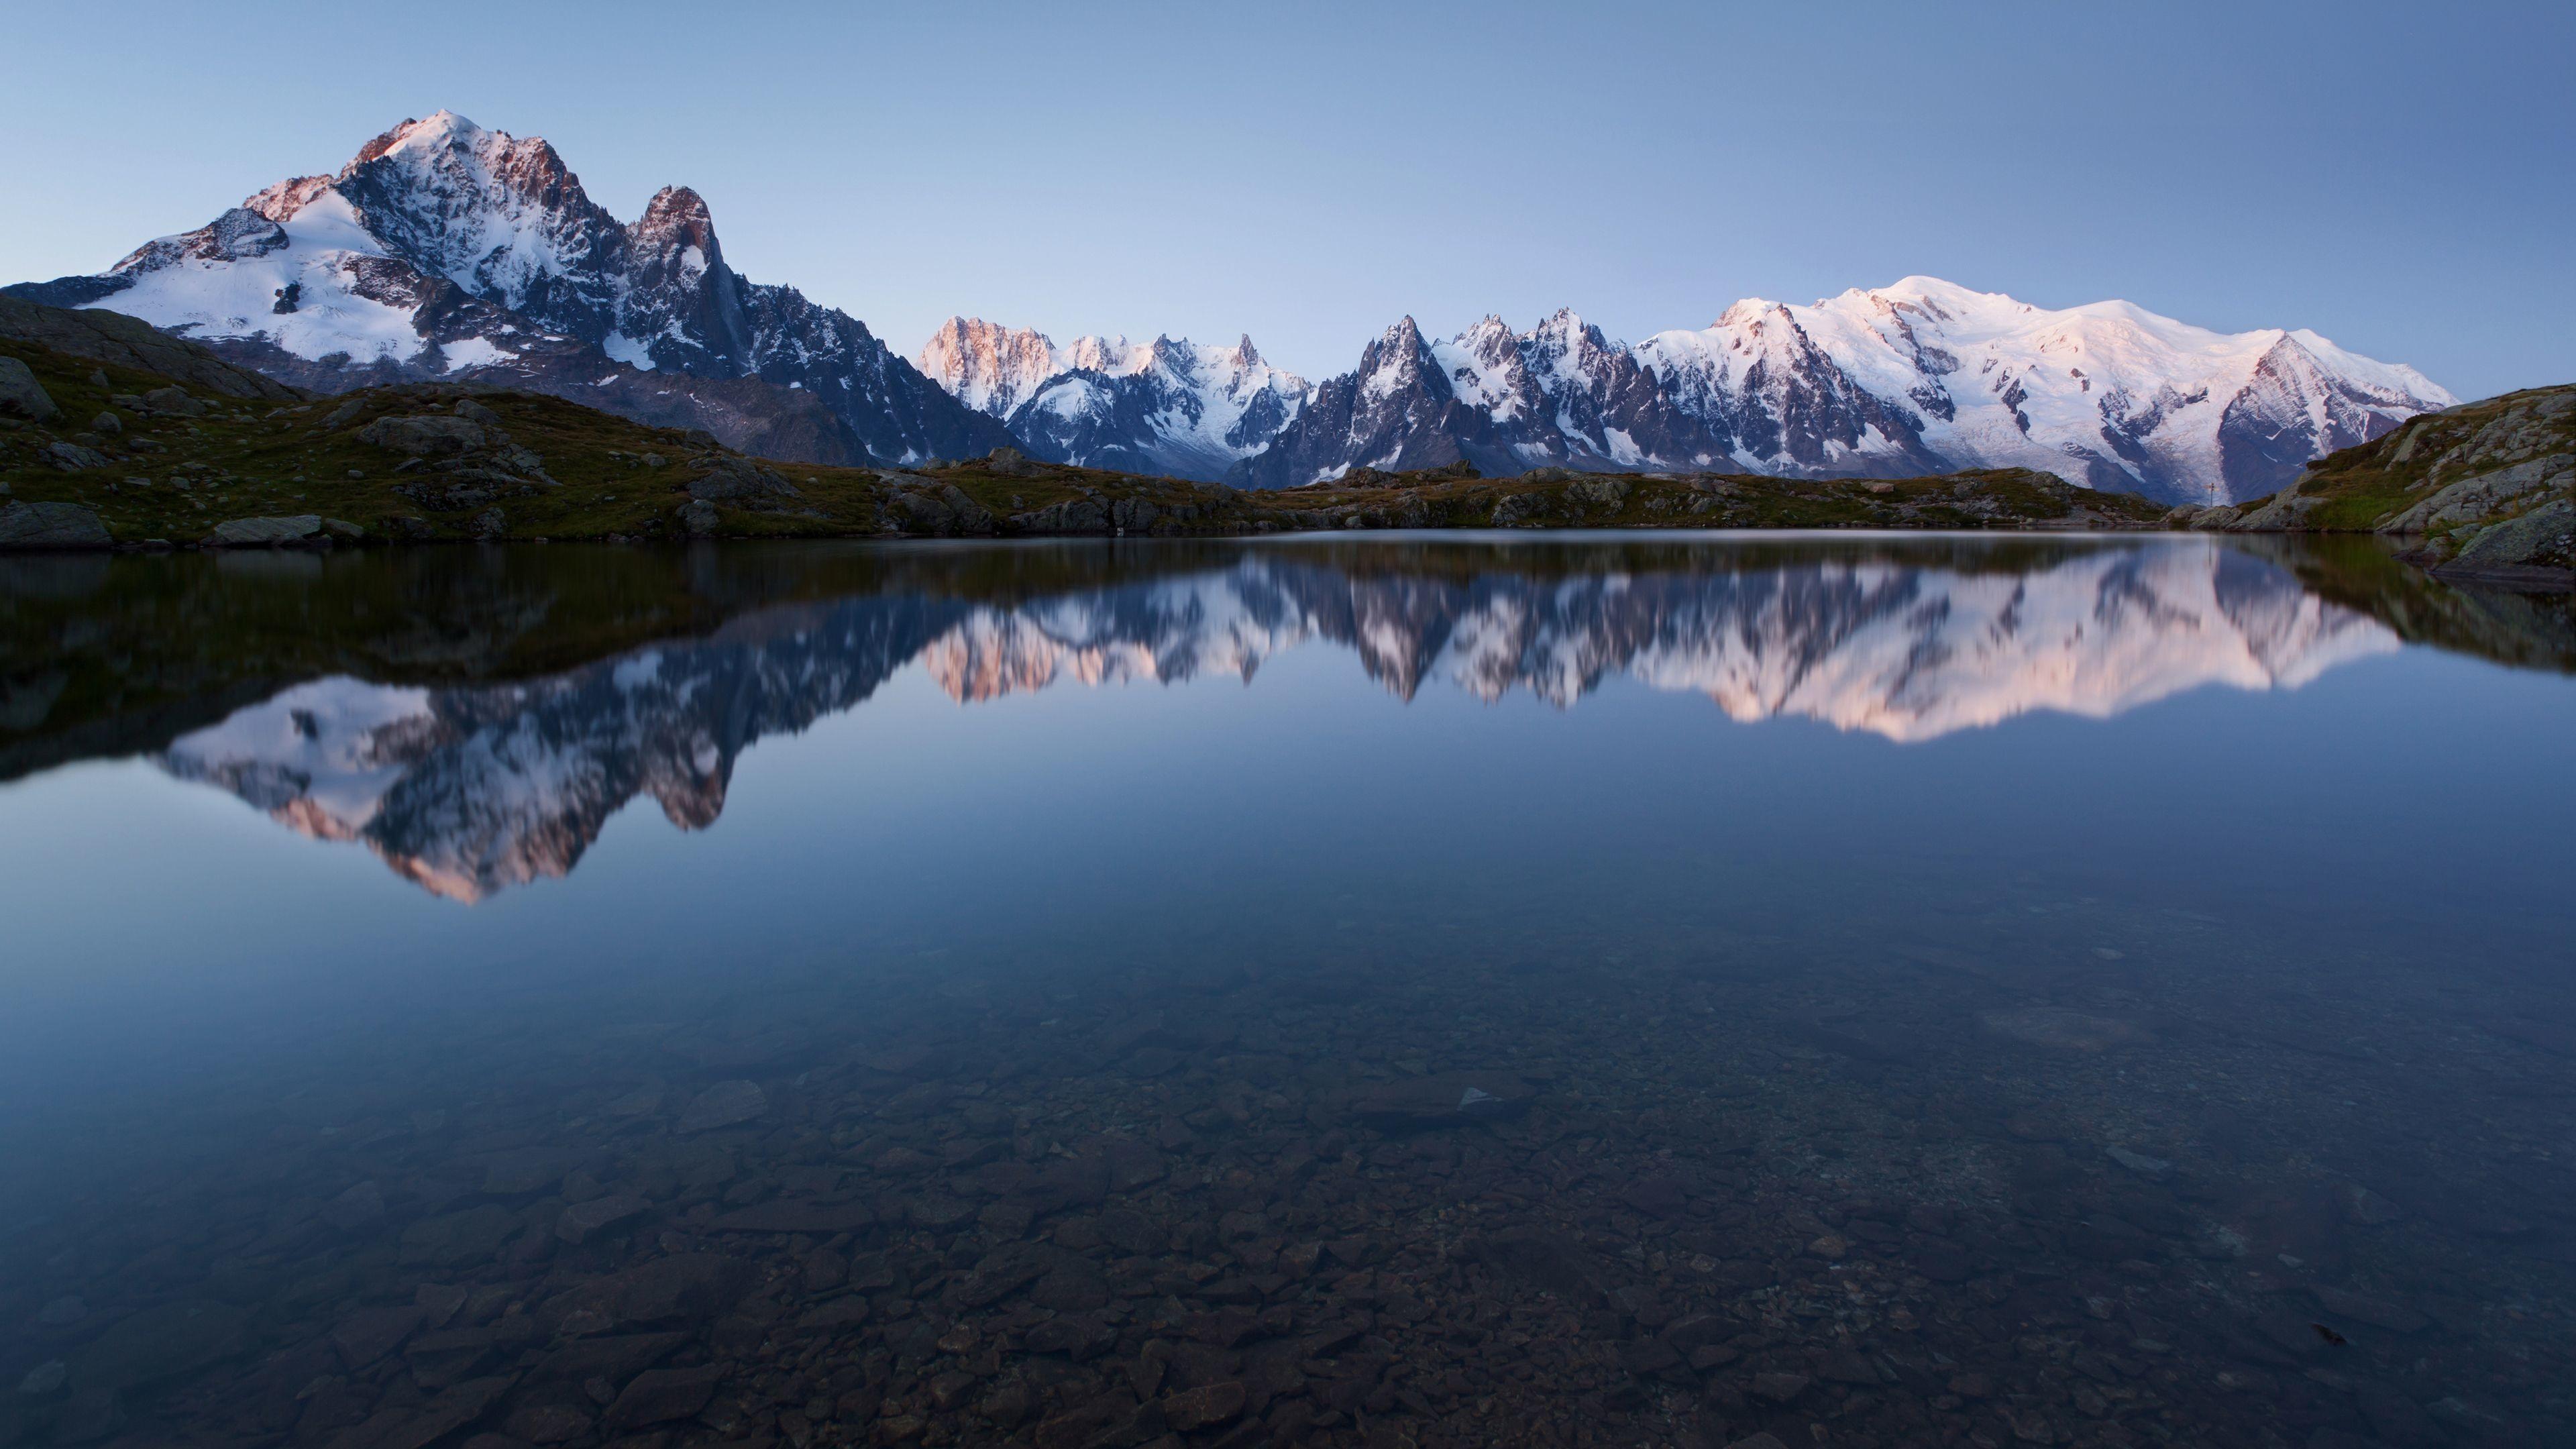 Snowy Mountains and Lake 4K Wallpaper